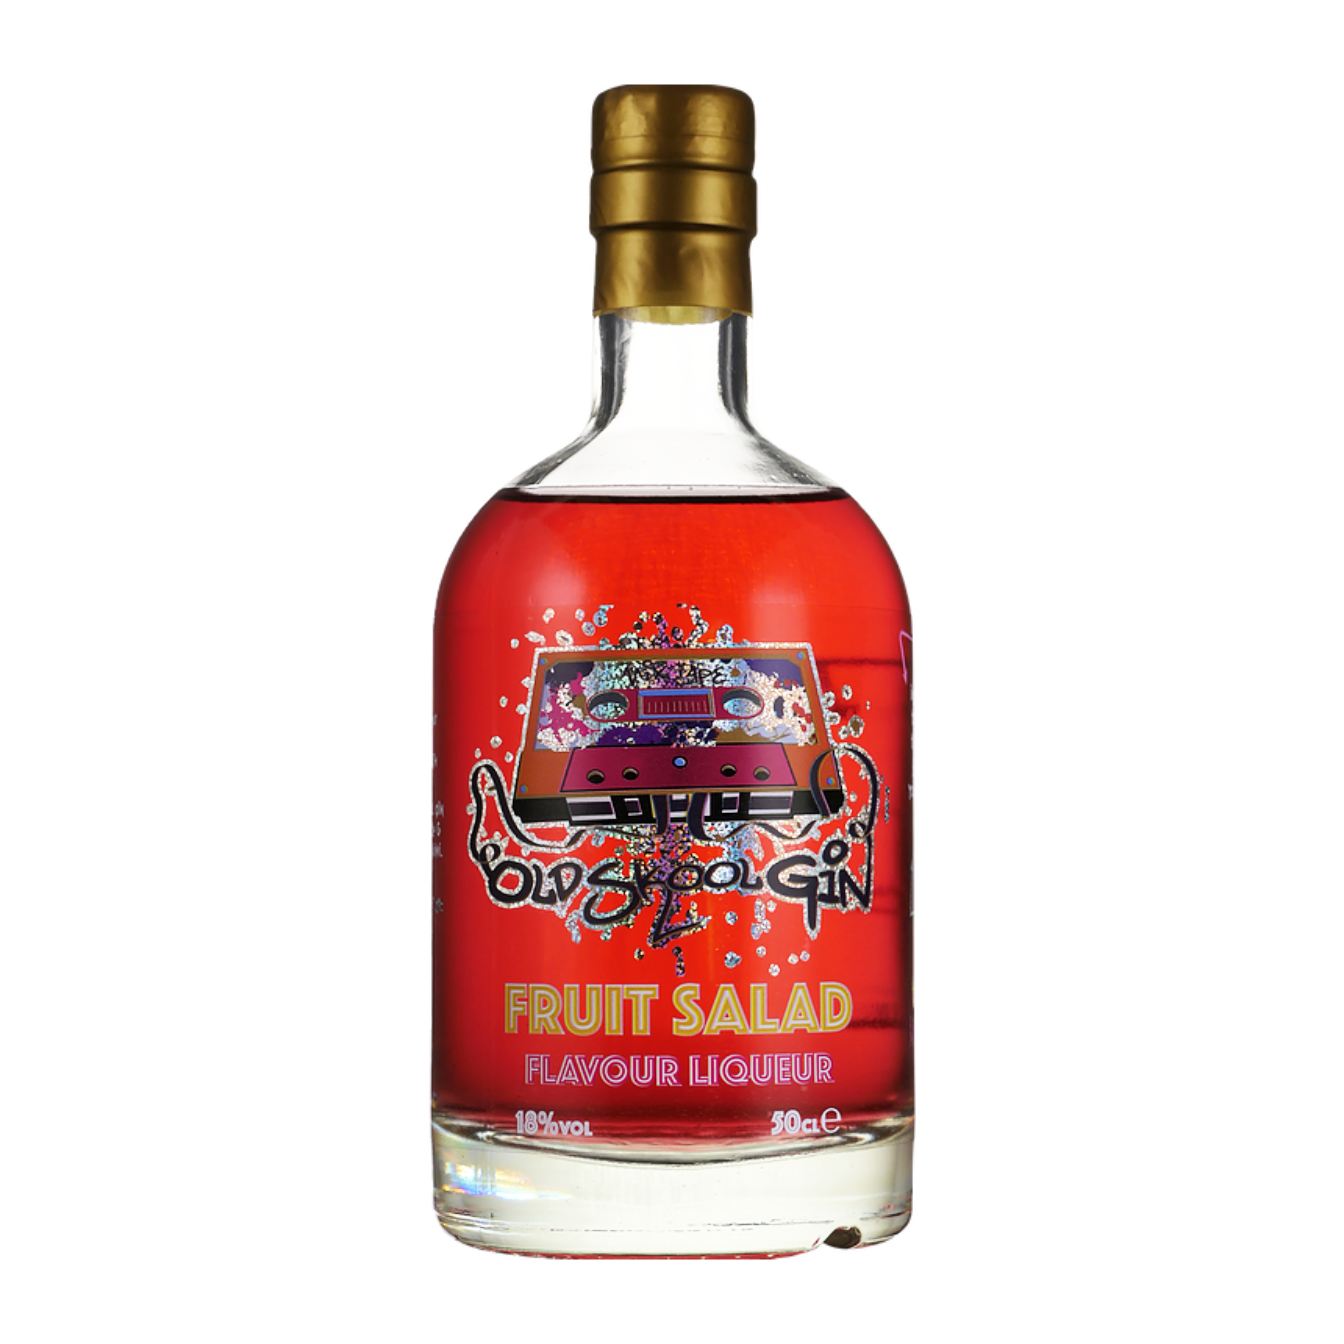 Old Skool Fruit Salad Gin Liqueur